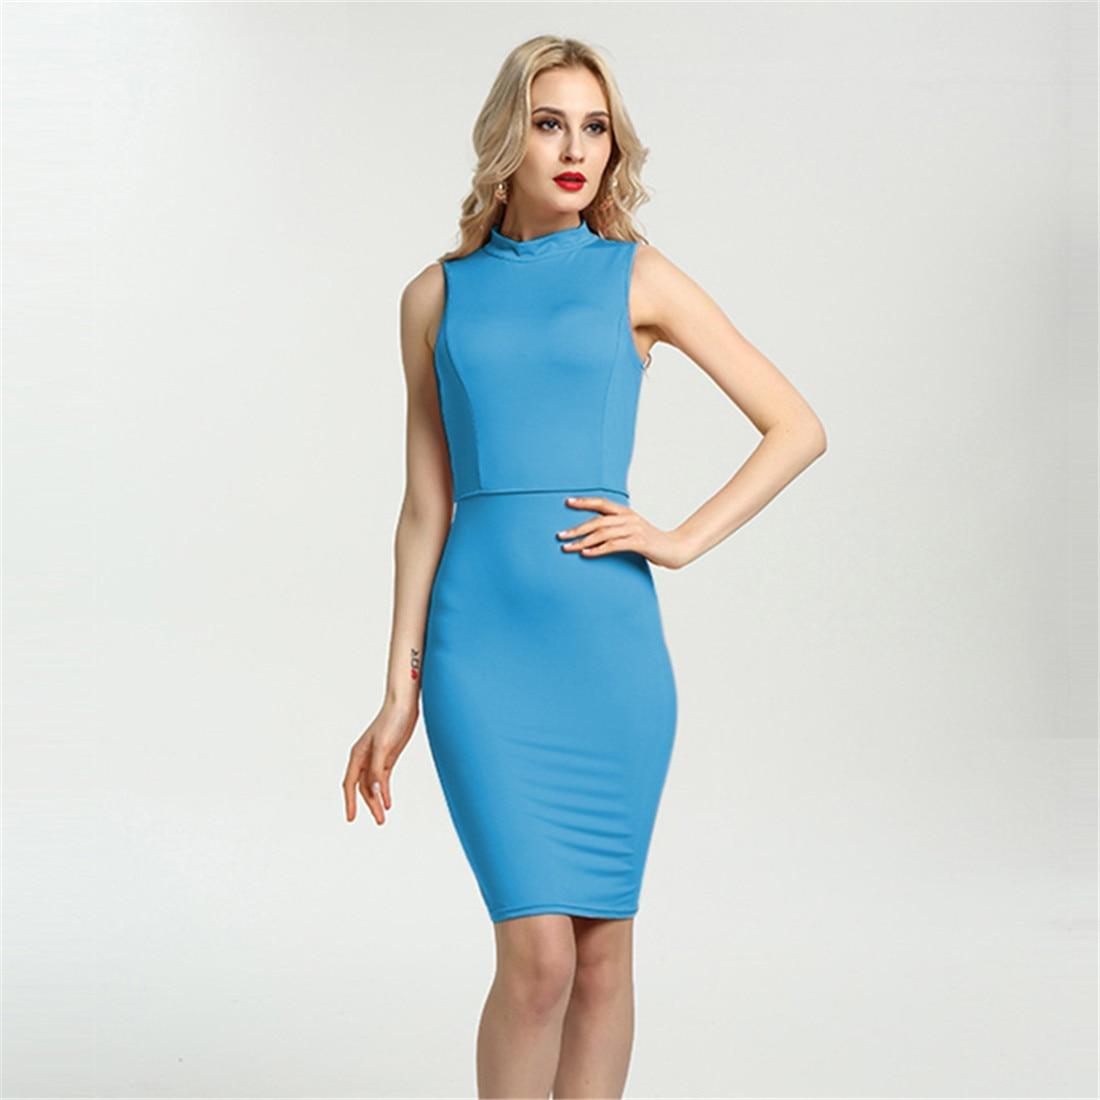 Aliexpress.com : Buy Plus Size Vintage Office Dress Women Sleeveless ...